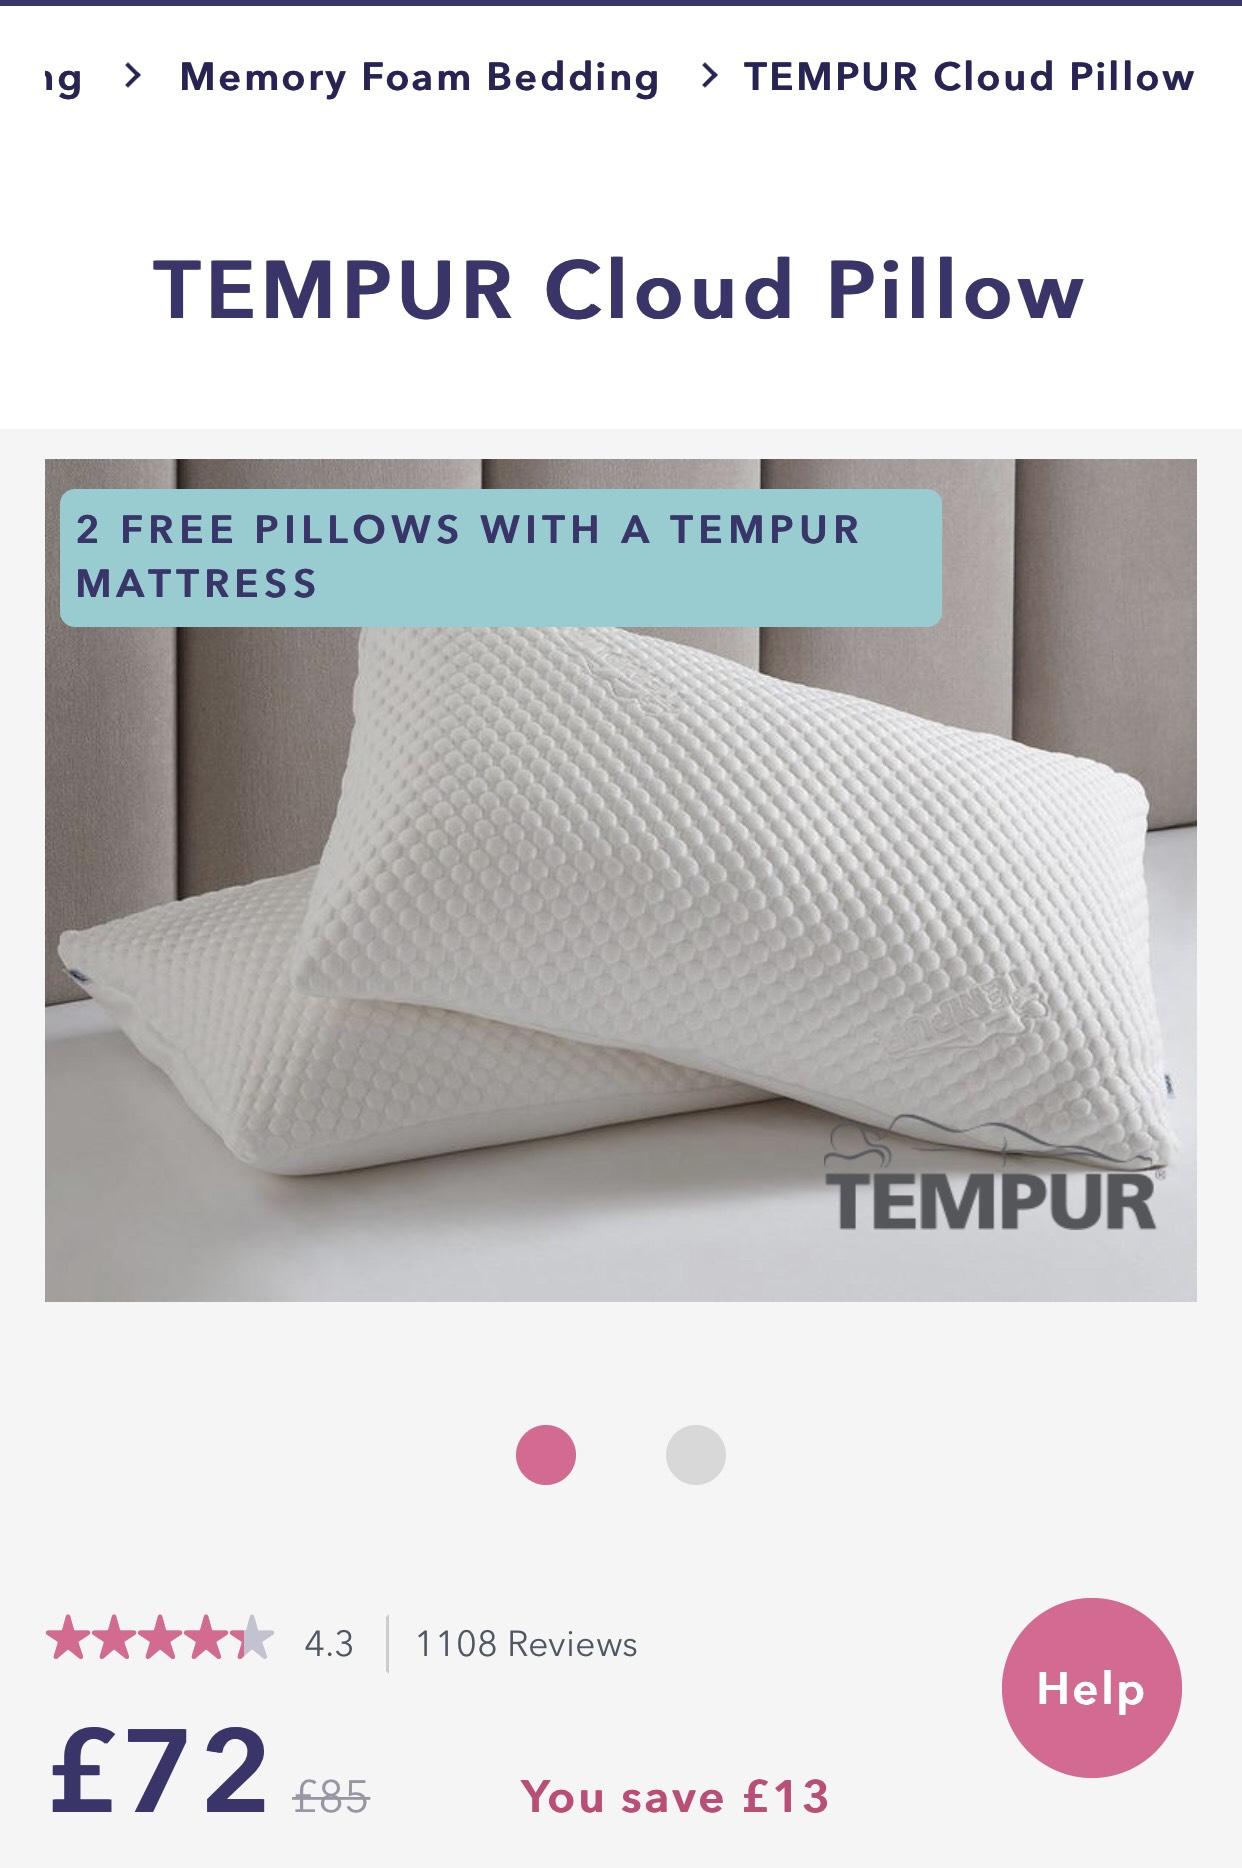 Tempur pillows at Dreams for £72